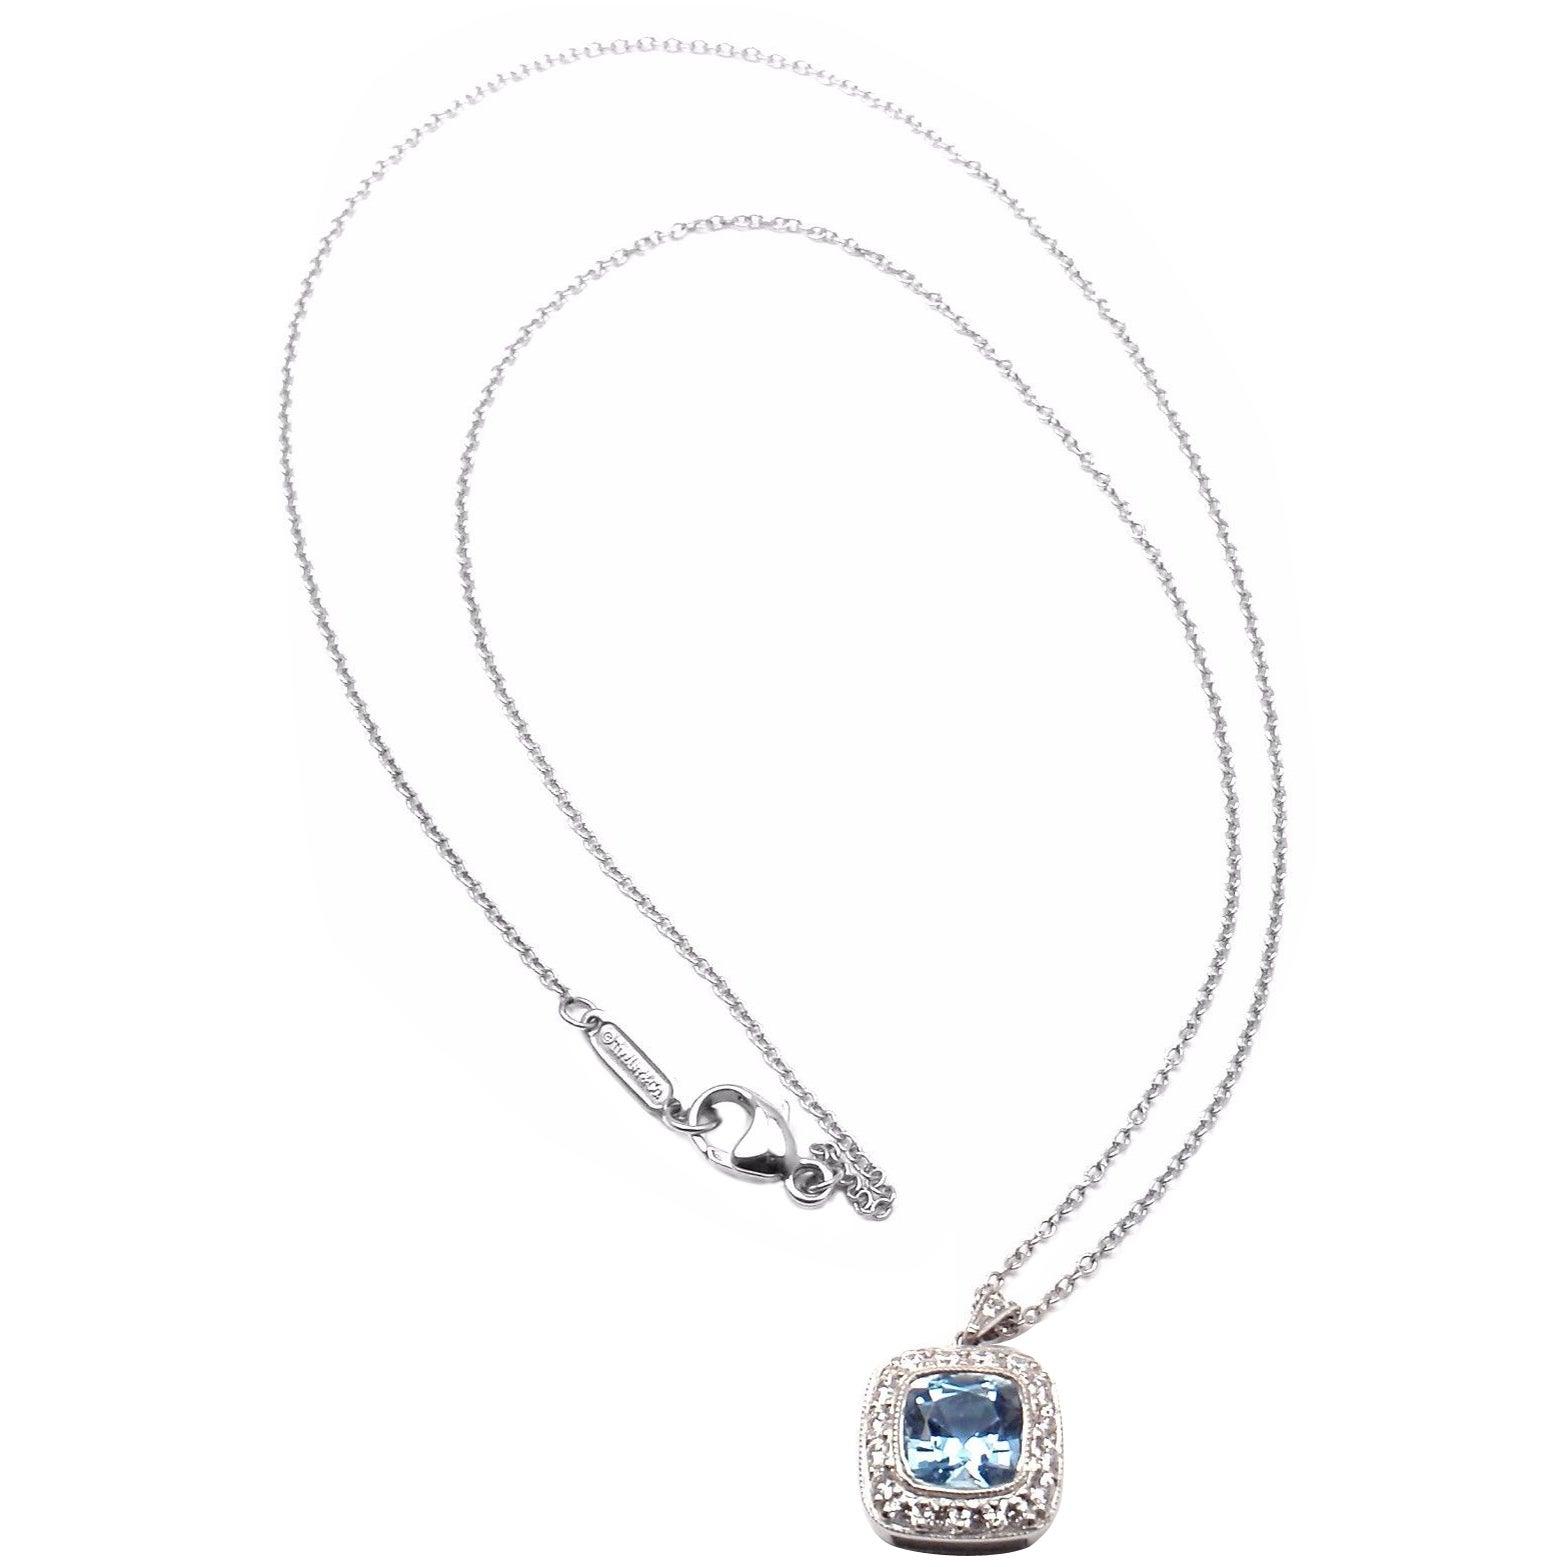 0f1548d08 Tiffany and Co. Aquamarine Diamond Platinum Legacy Pendant Necklace at  1stdibs